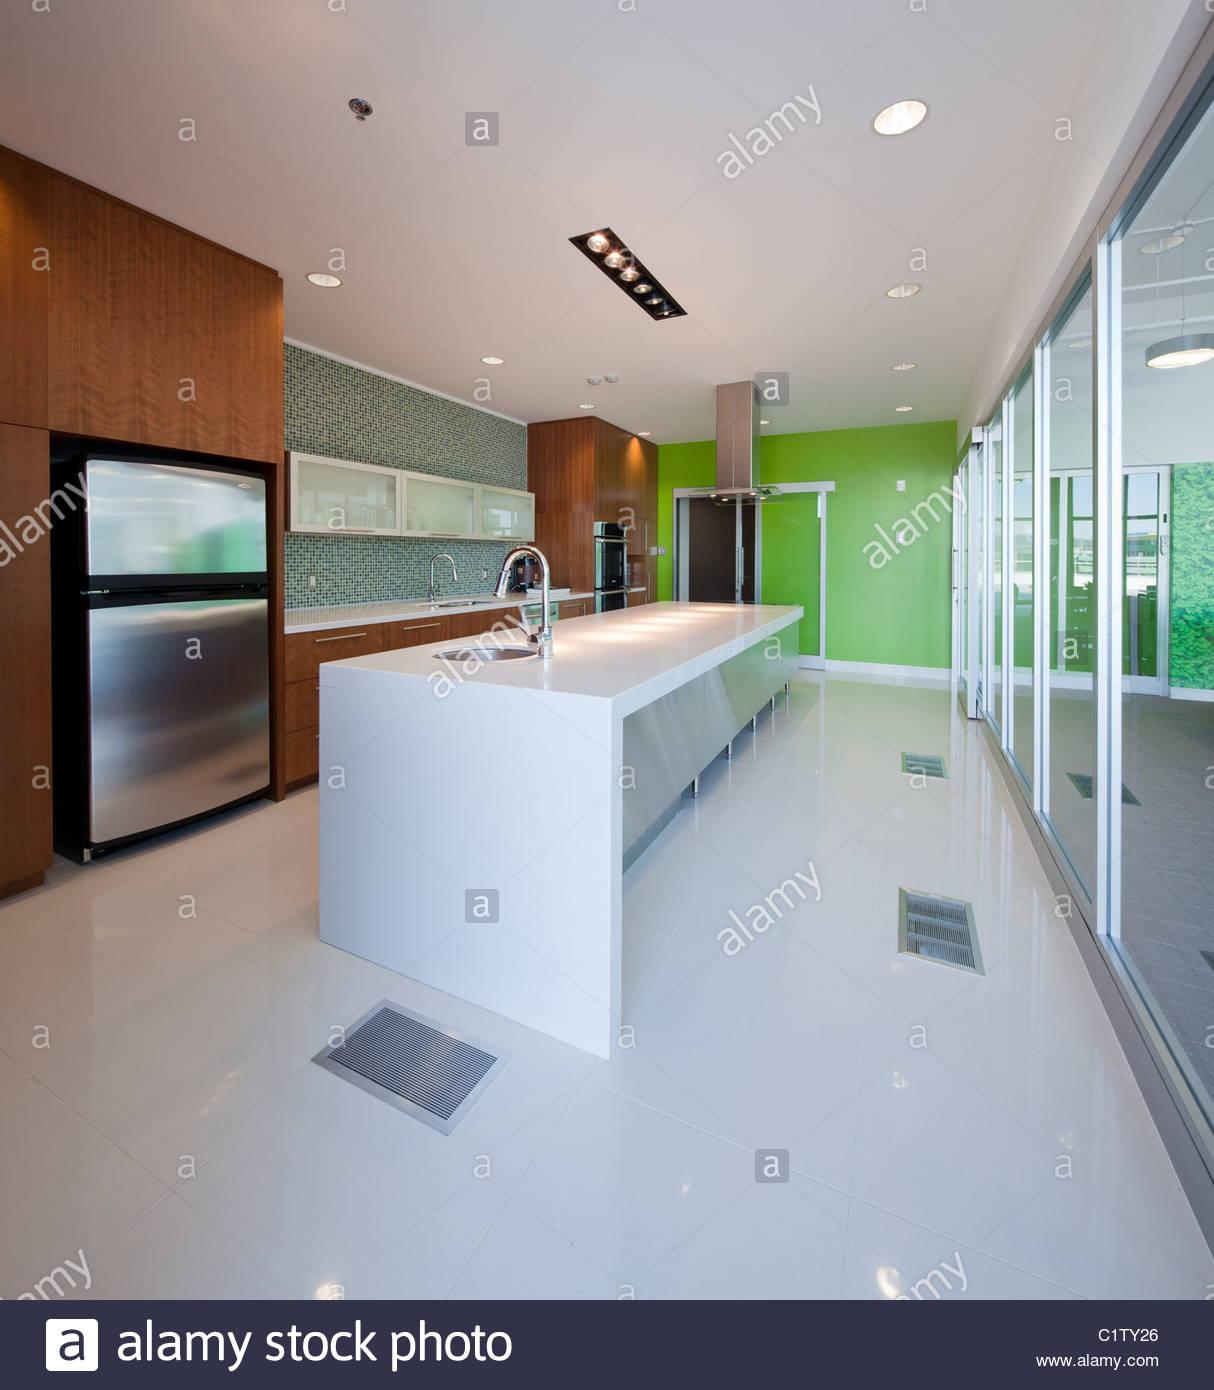 Commercial Kitchen Design Stock Photos & Commercial